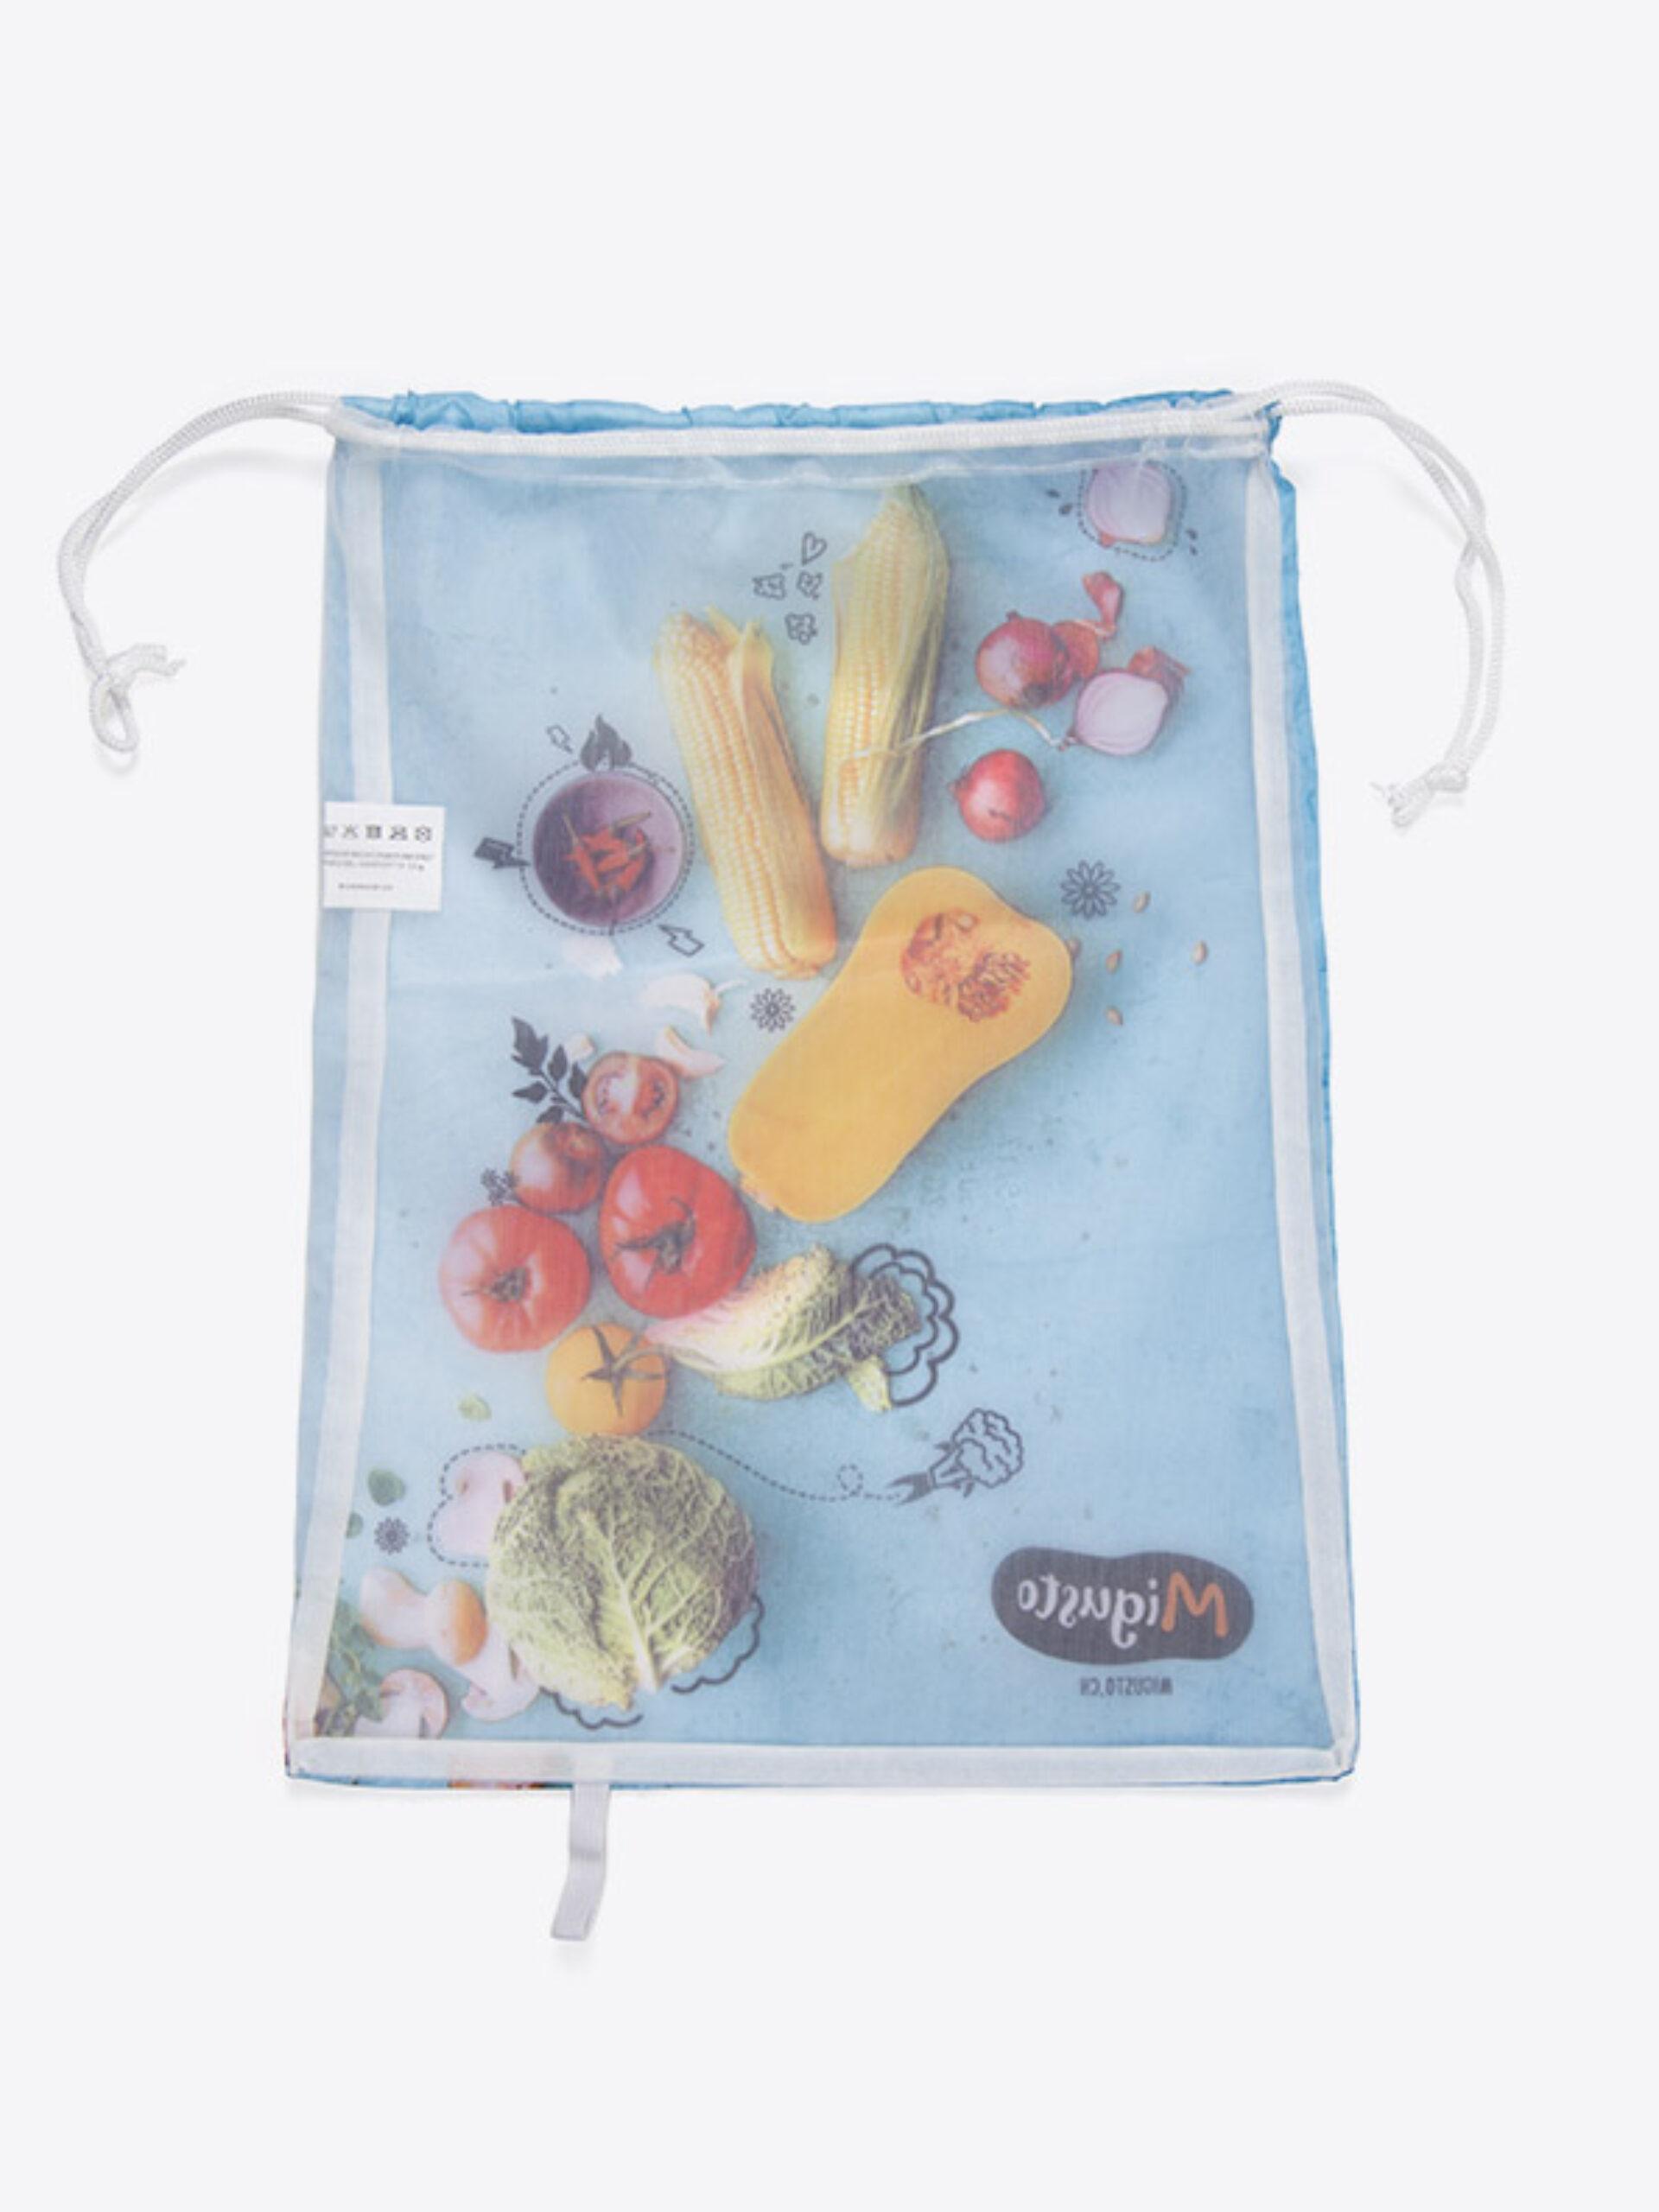 Veggie Bag Gemuese Fruechte Sack Digitaldruck Bestellen